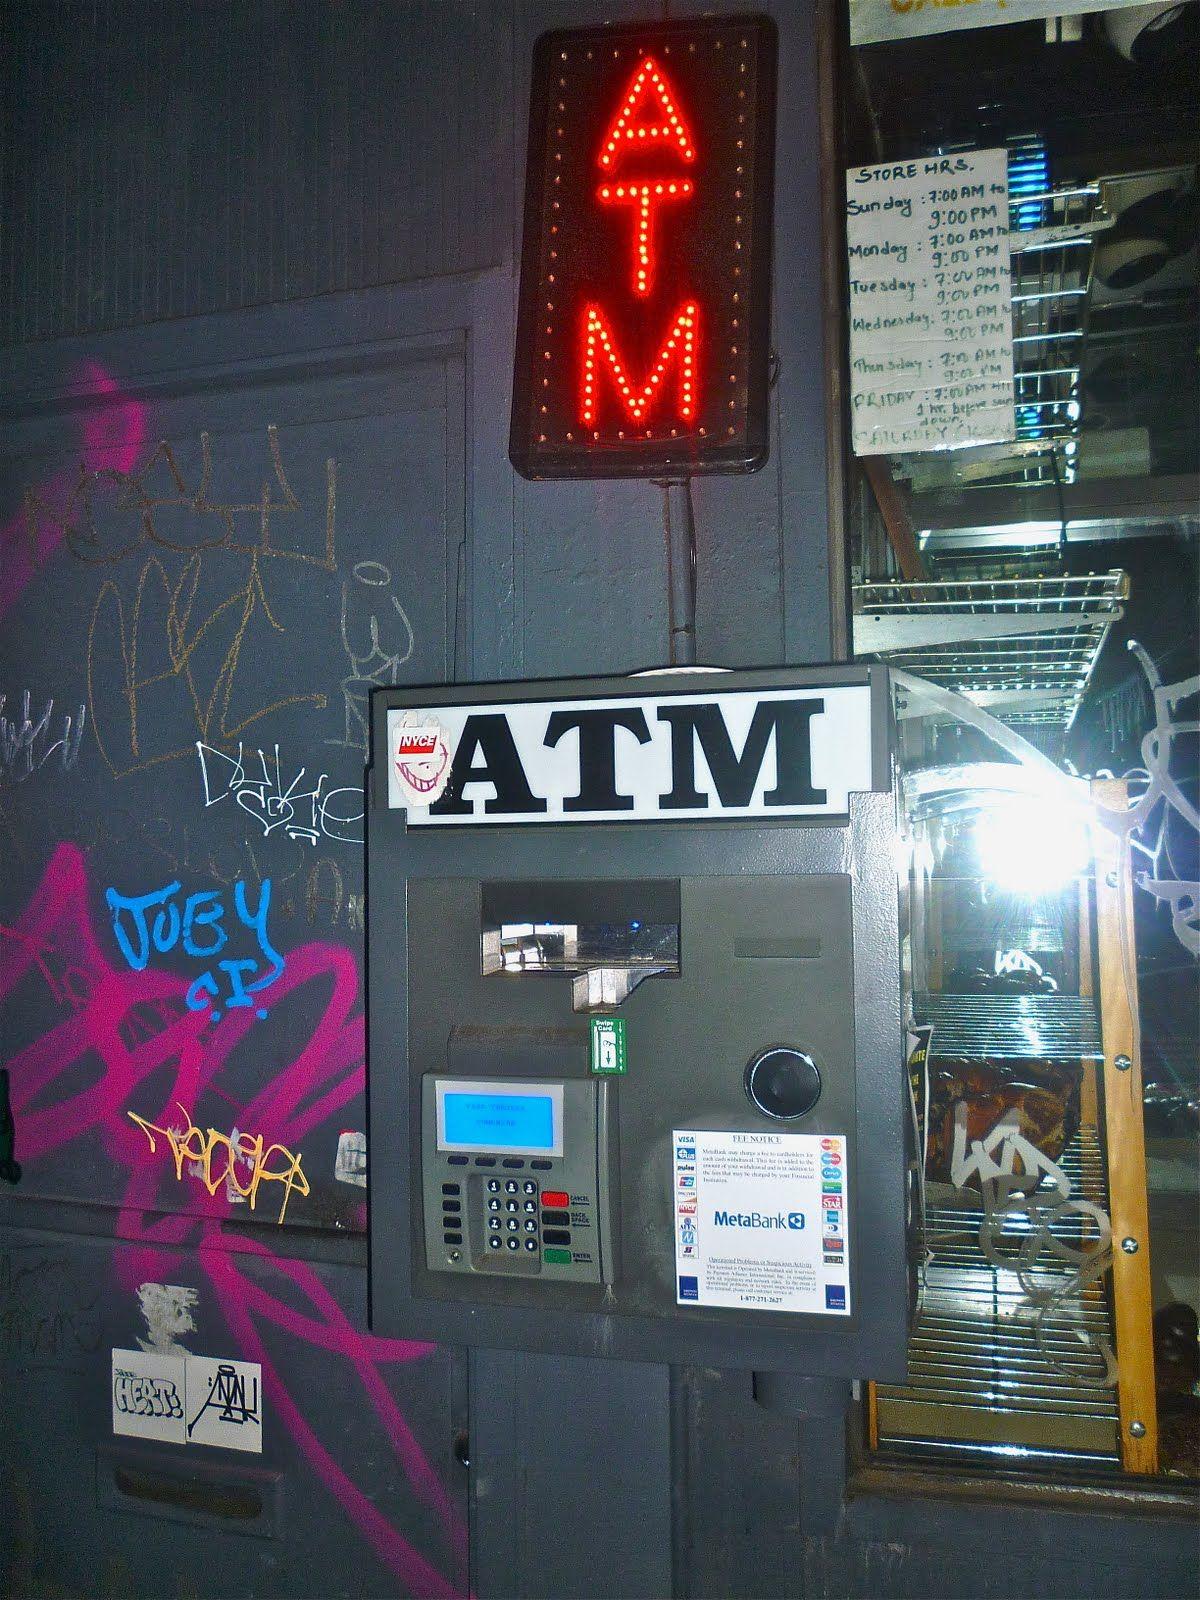 Pin on atmgram